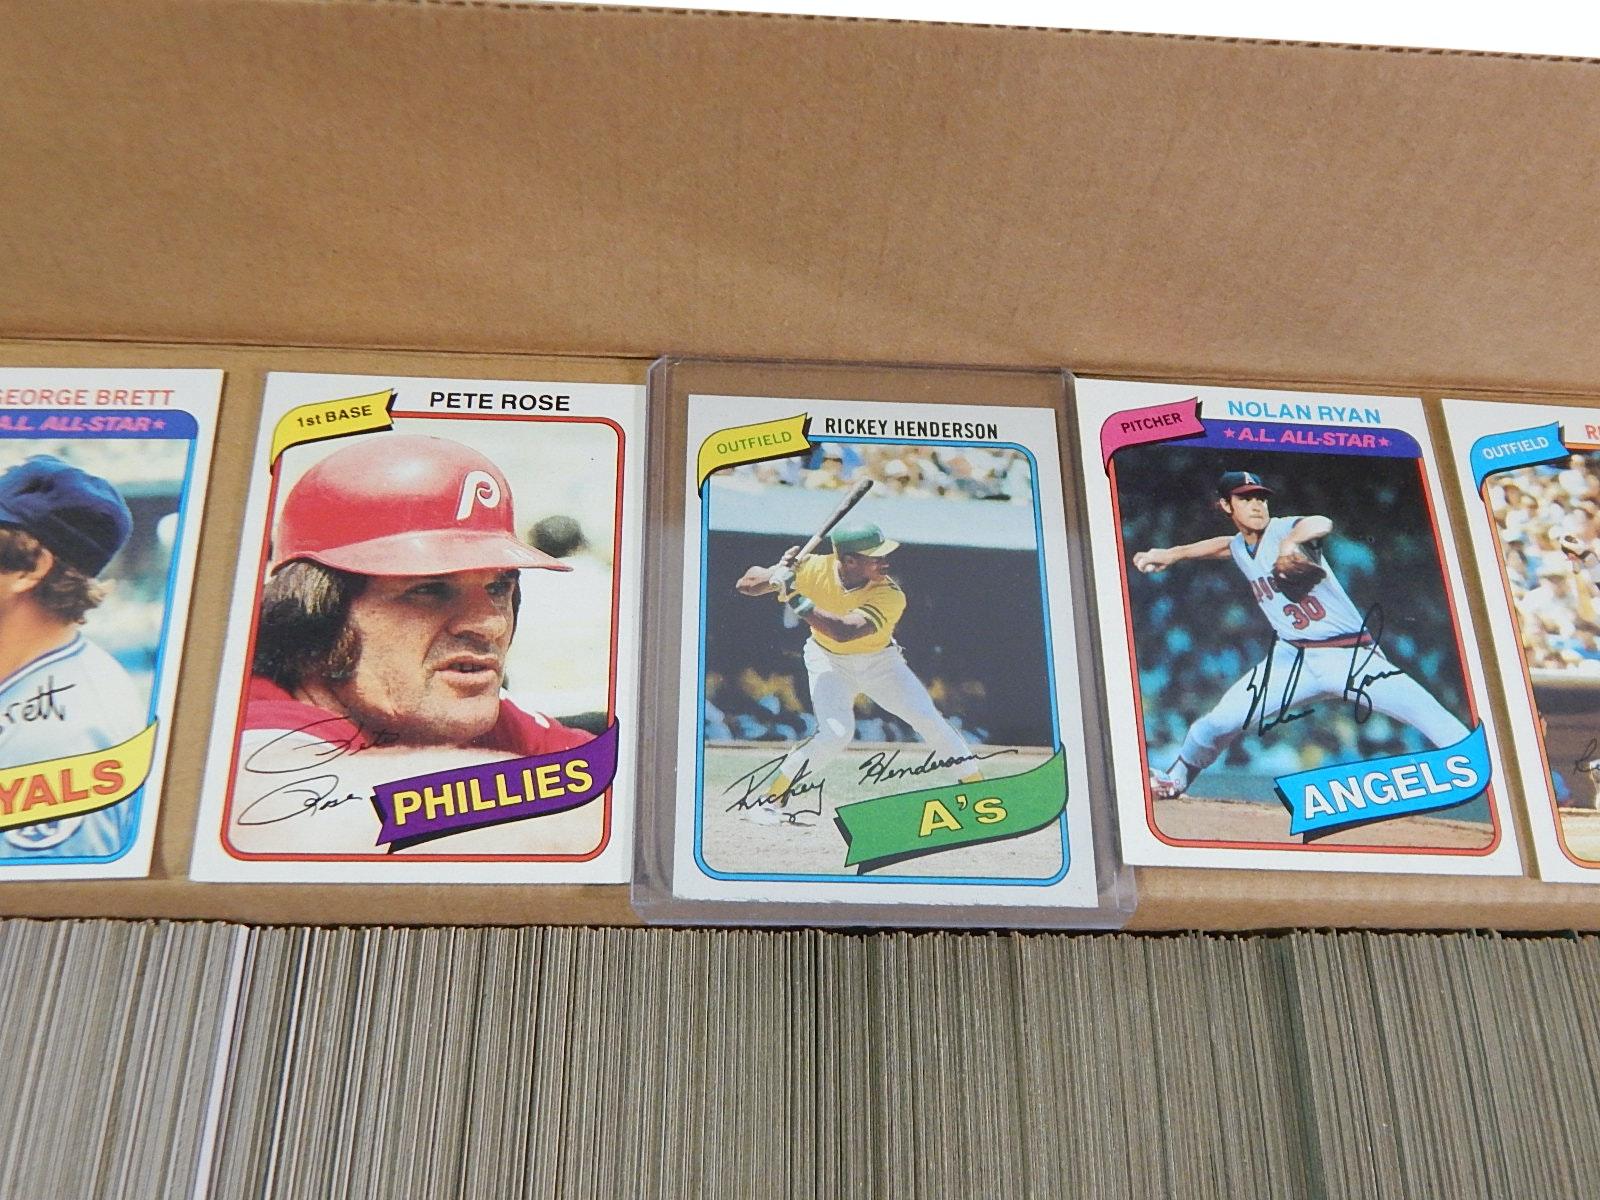 1980 Complete Topps Baseball Card Set with Henderson Rookie, Brett, Rose, More